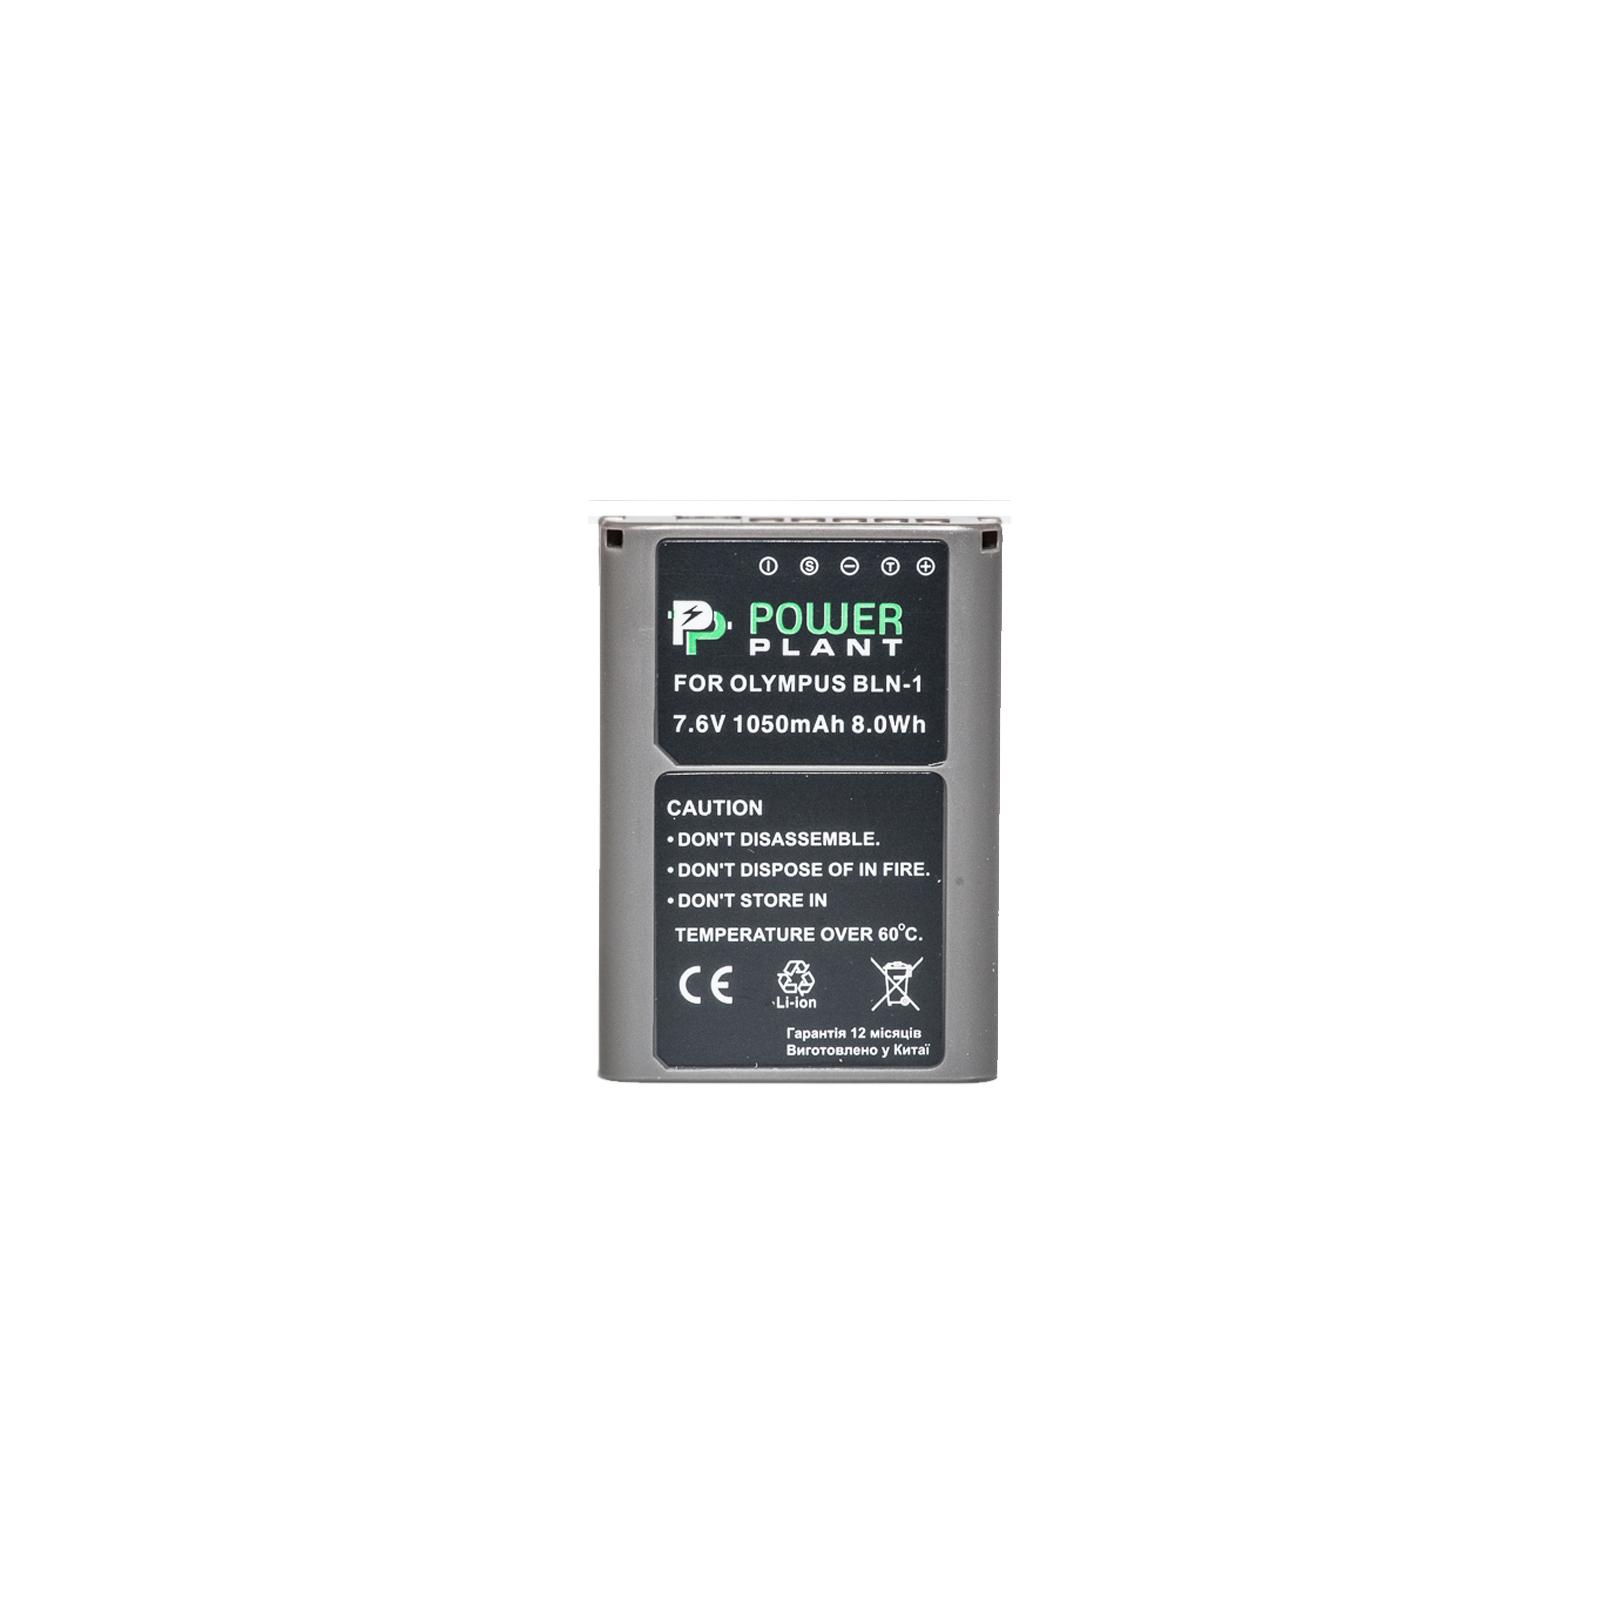 Аккумулятор к фото/видео PowerPlant Olympus PS-BLN1 (DV00DV1332) изображение 2